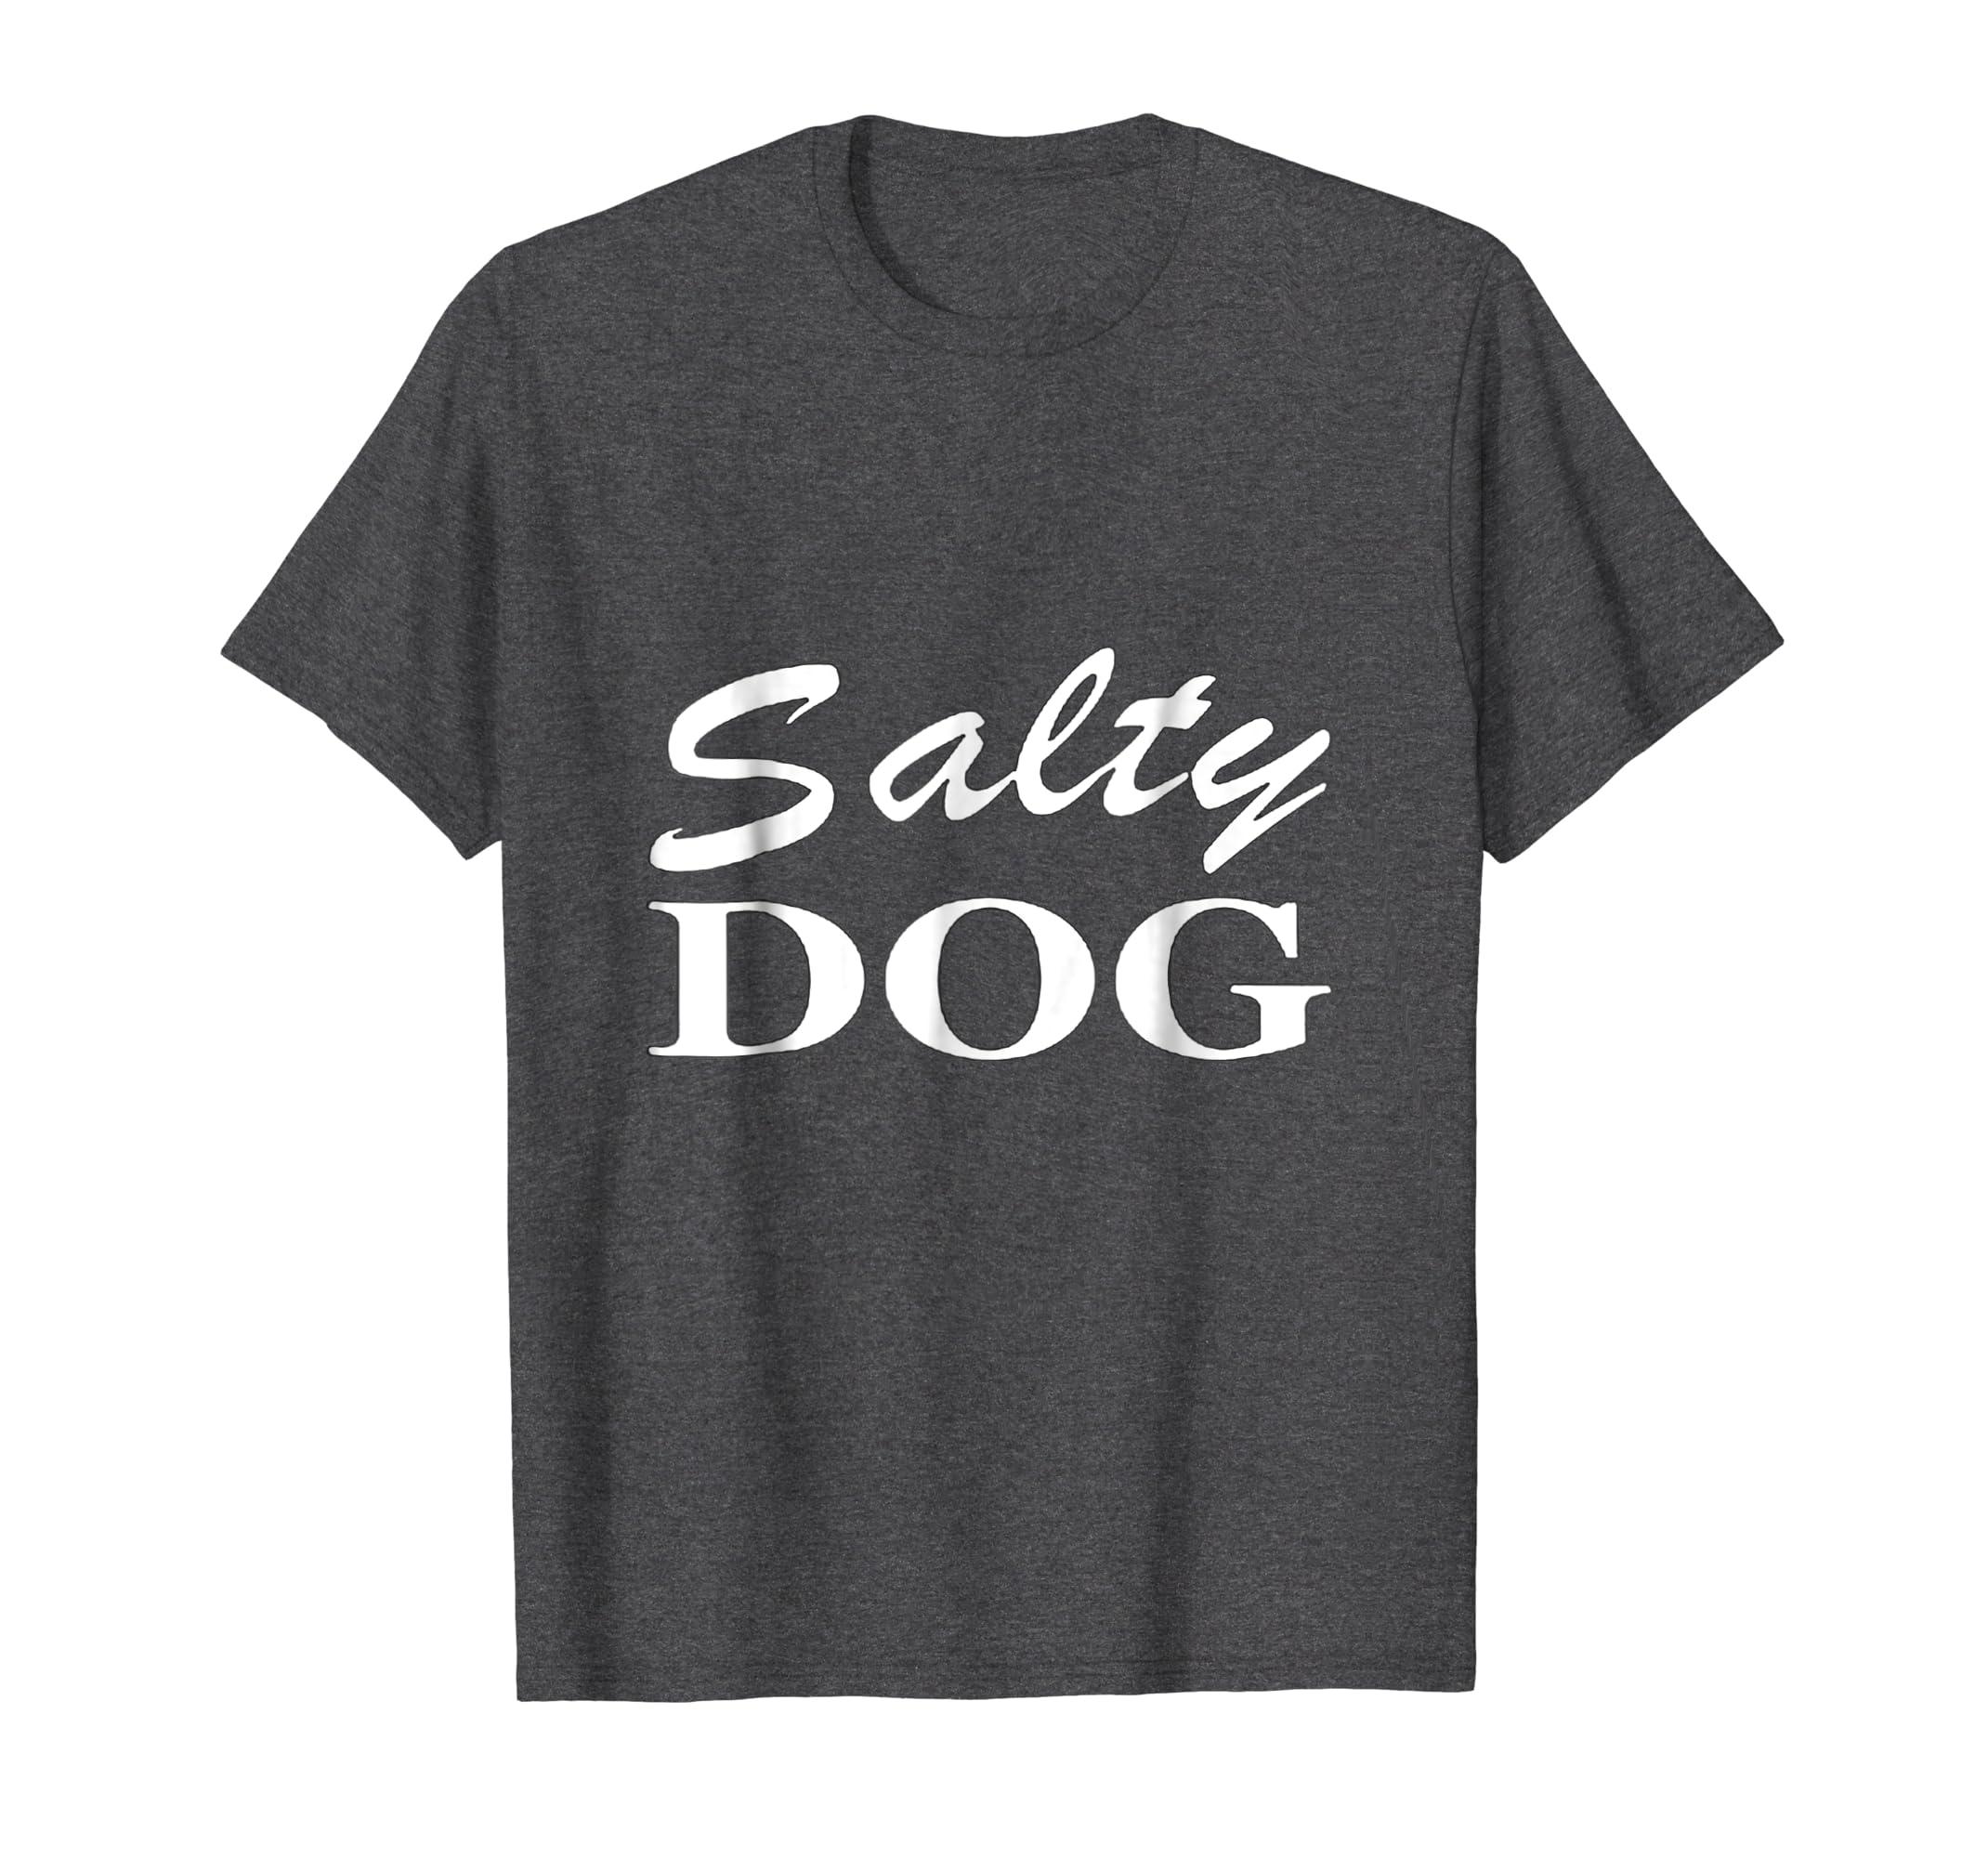 'Salty DOG' Retro Vintage Cool T Shirt-Newstyleth